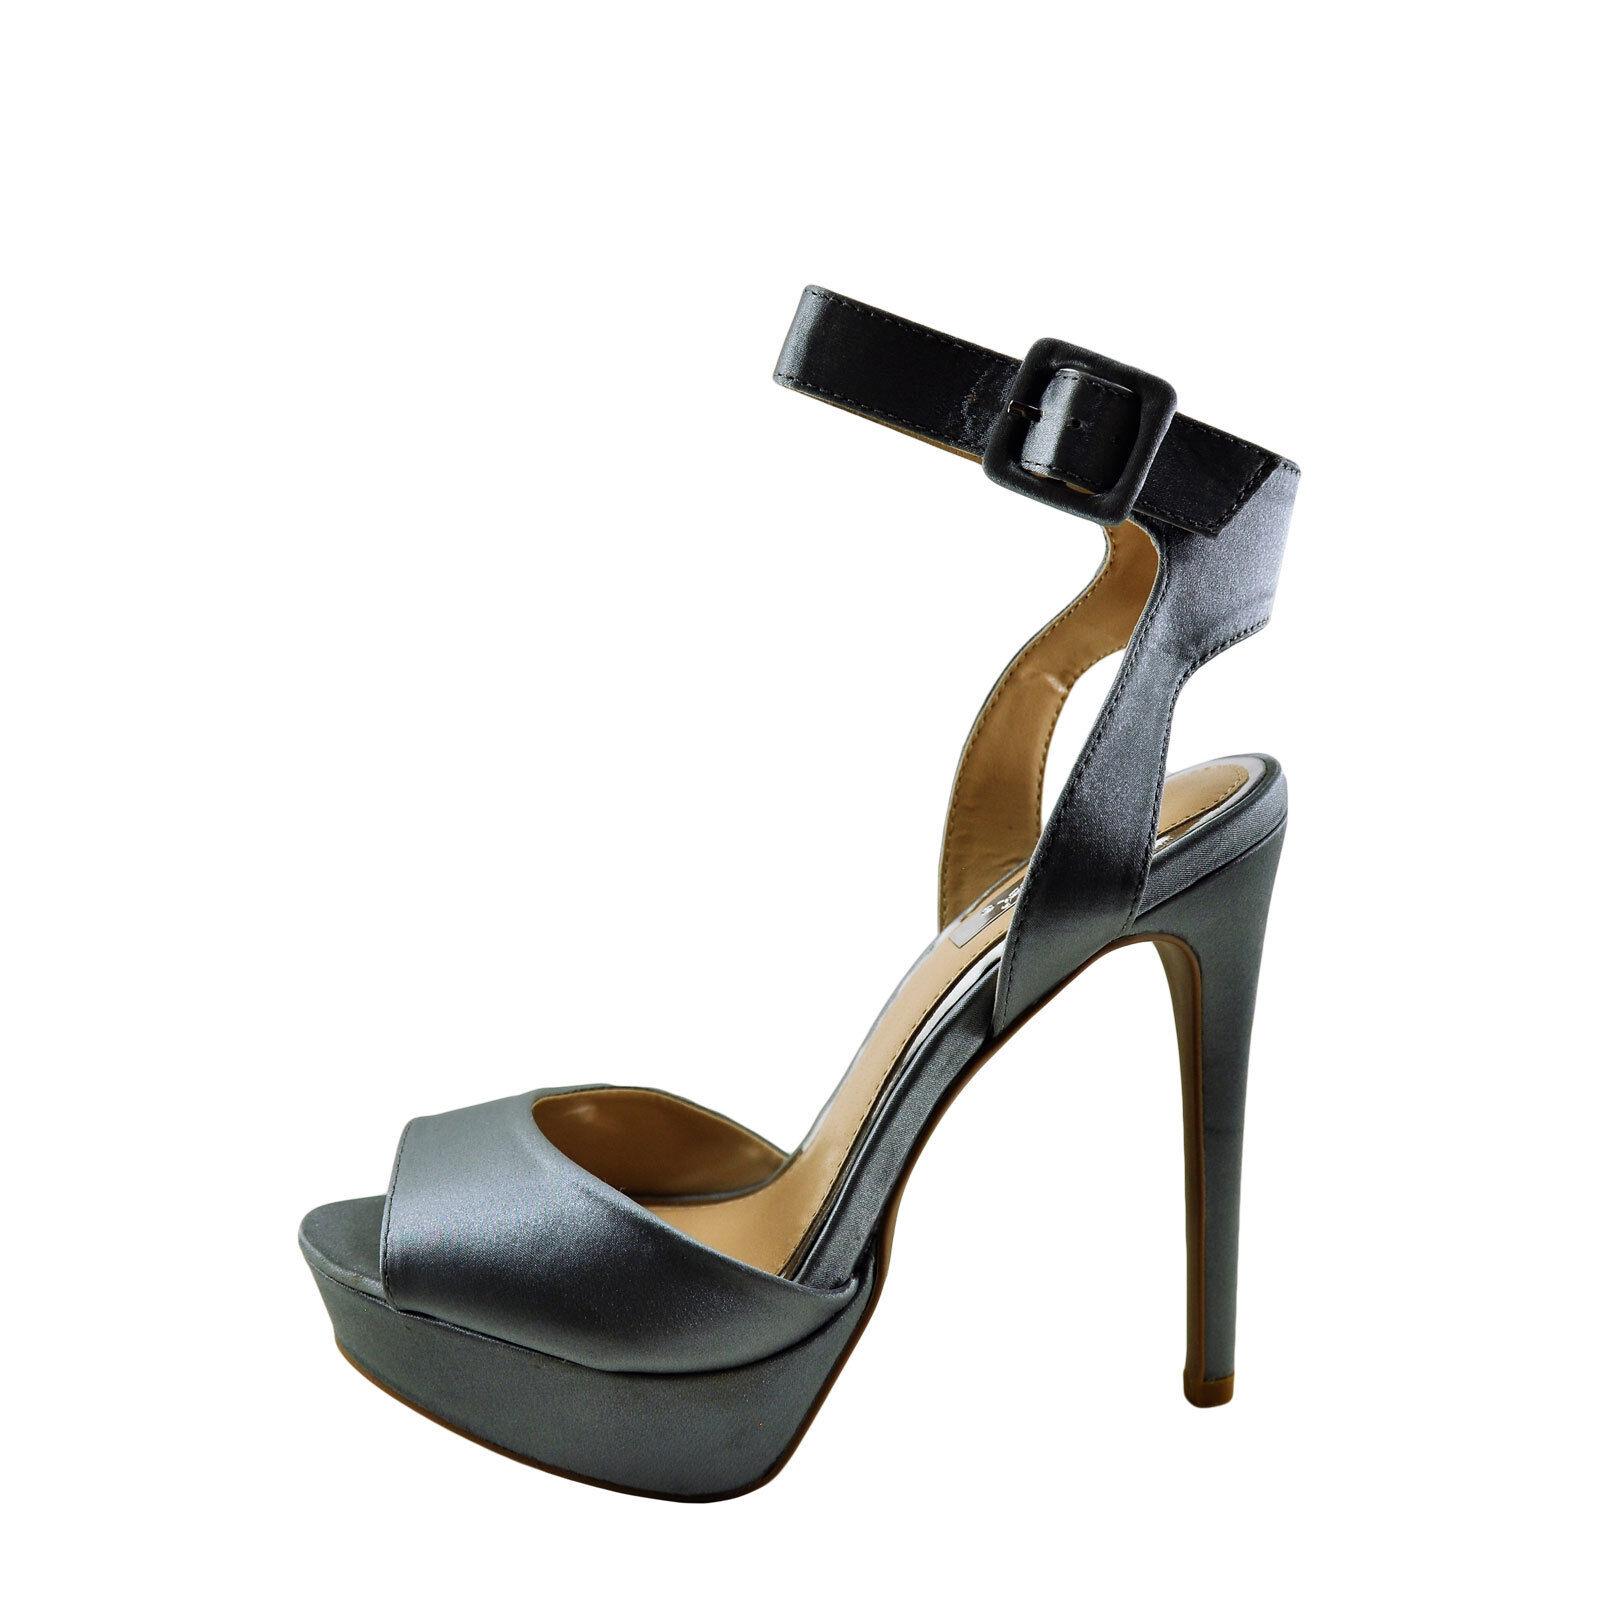 Qupid Avalon-187 Pewter Satin Women's Peep Toe Ankle Strap Heel